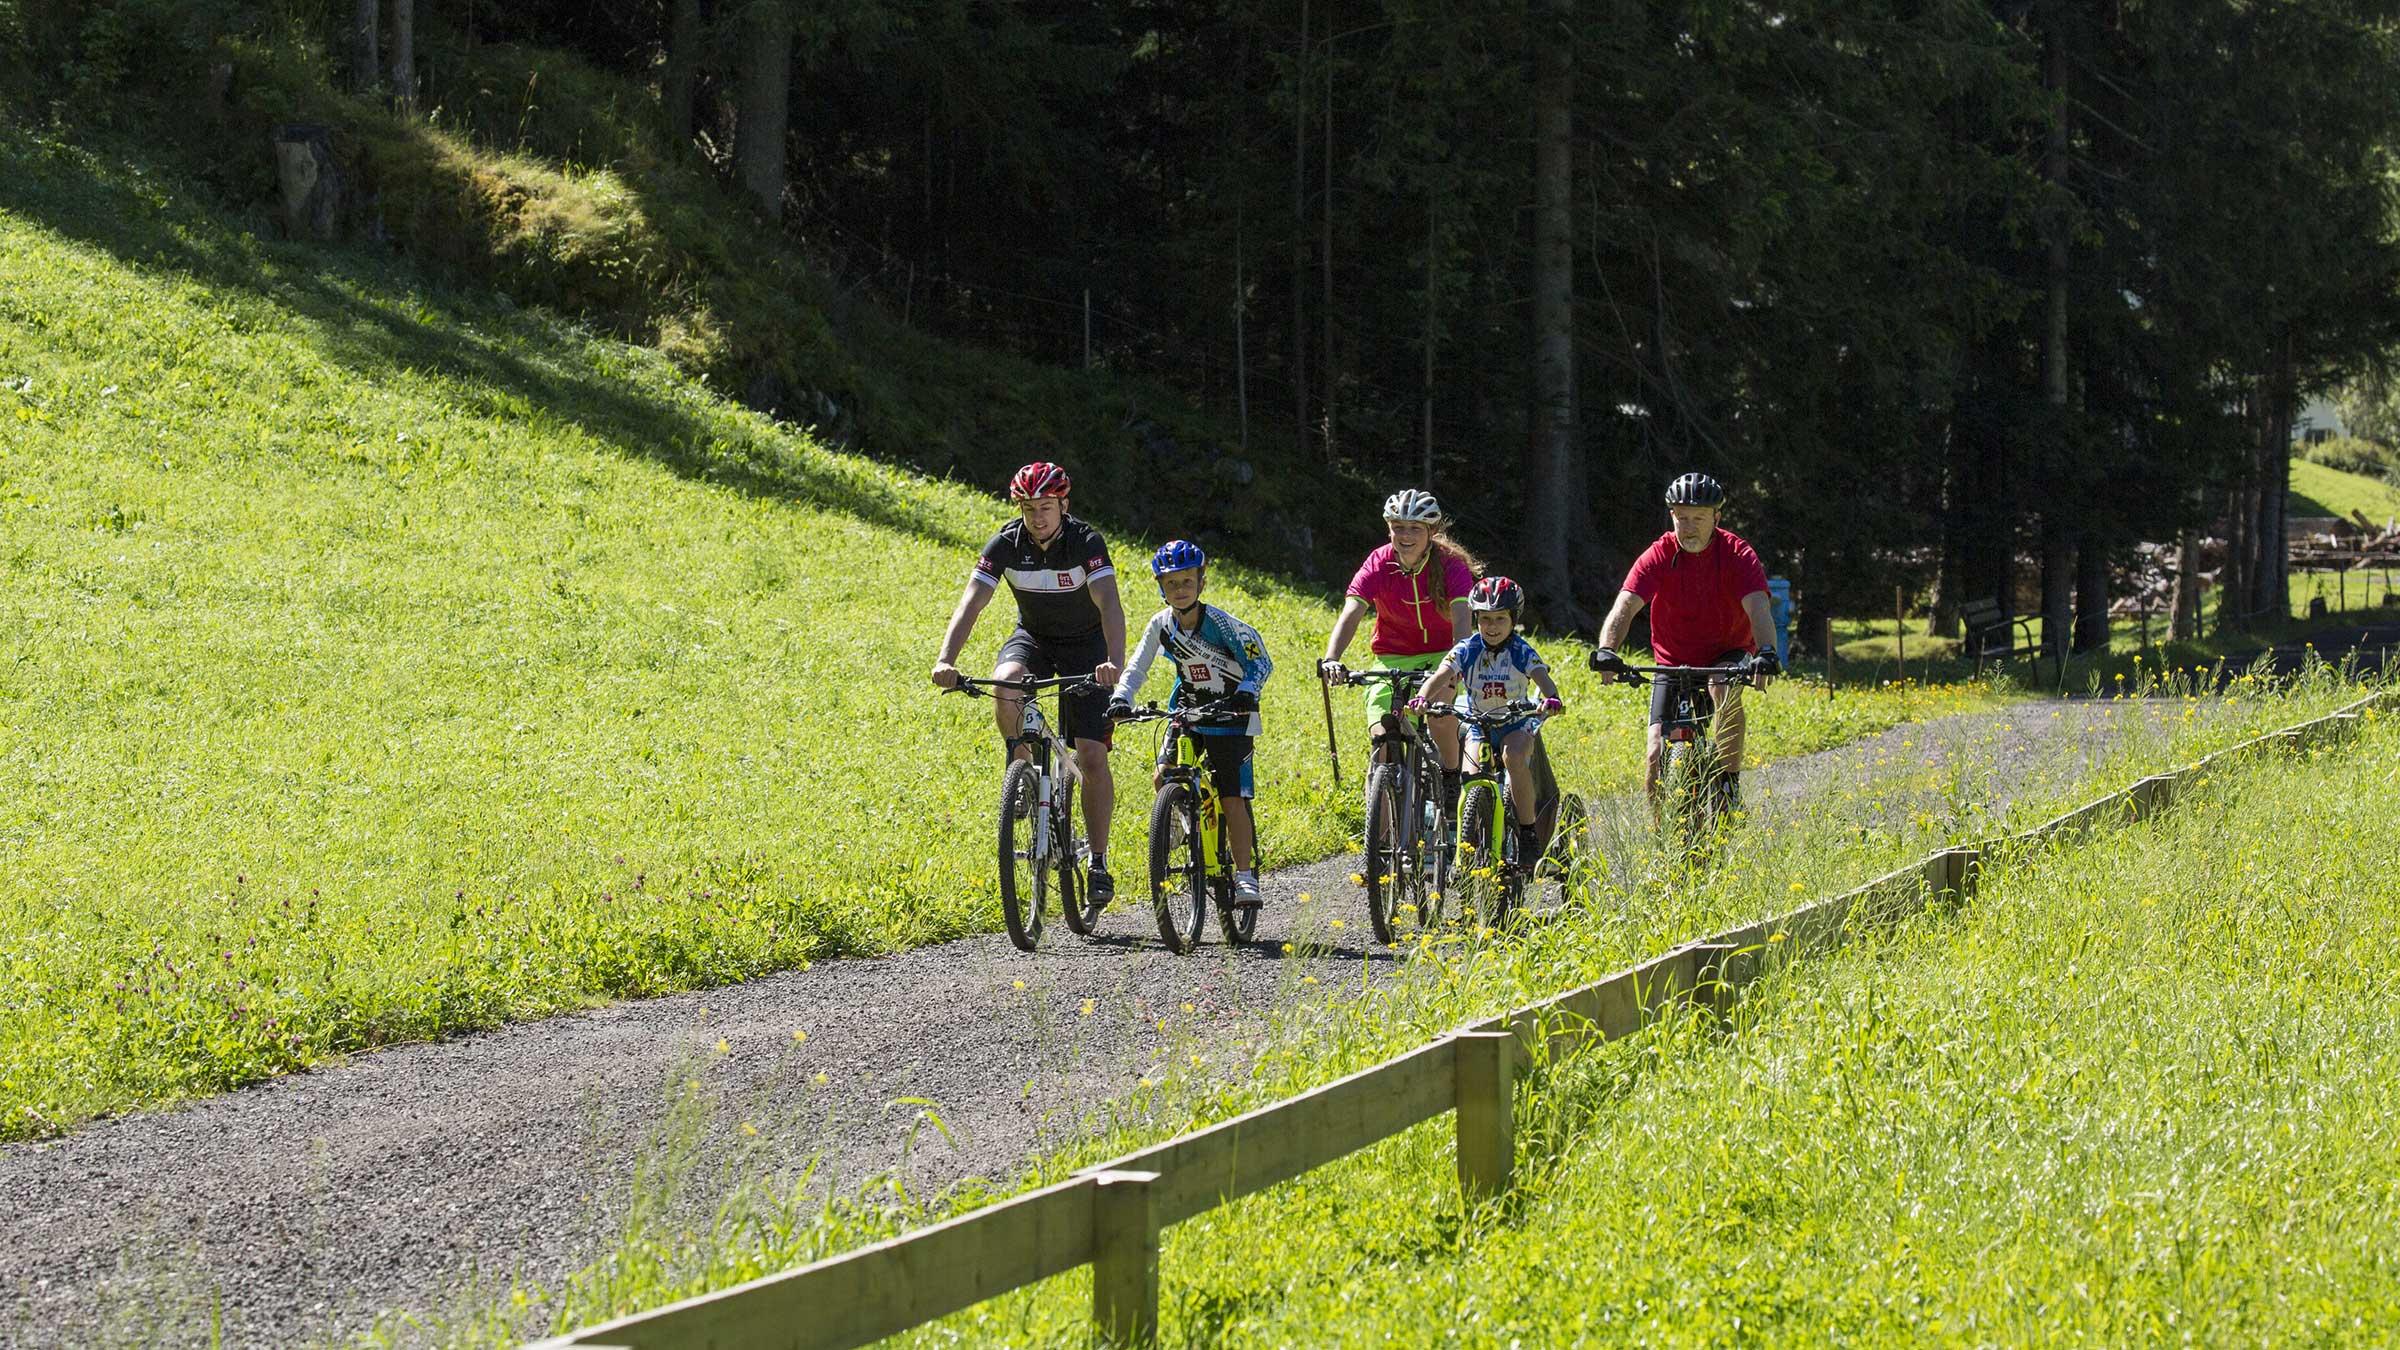 Gruppe Radfahrer auf Radweg - Ötztaler Radweg